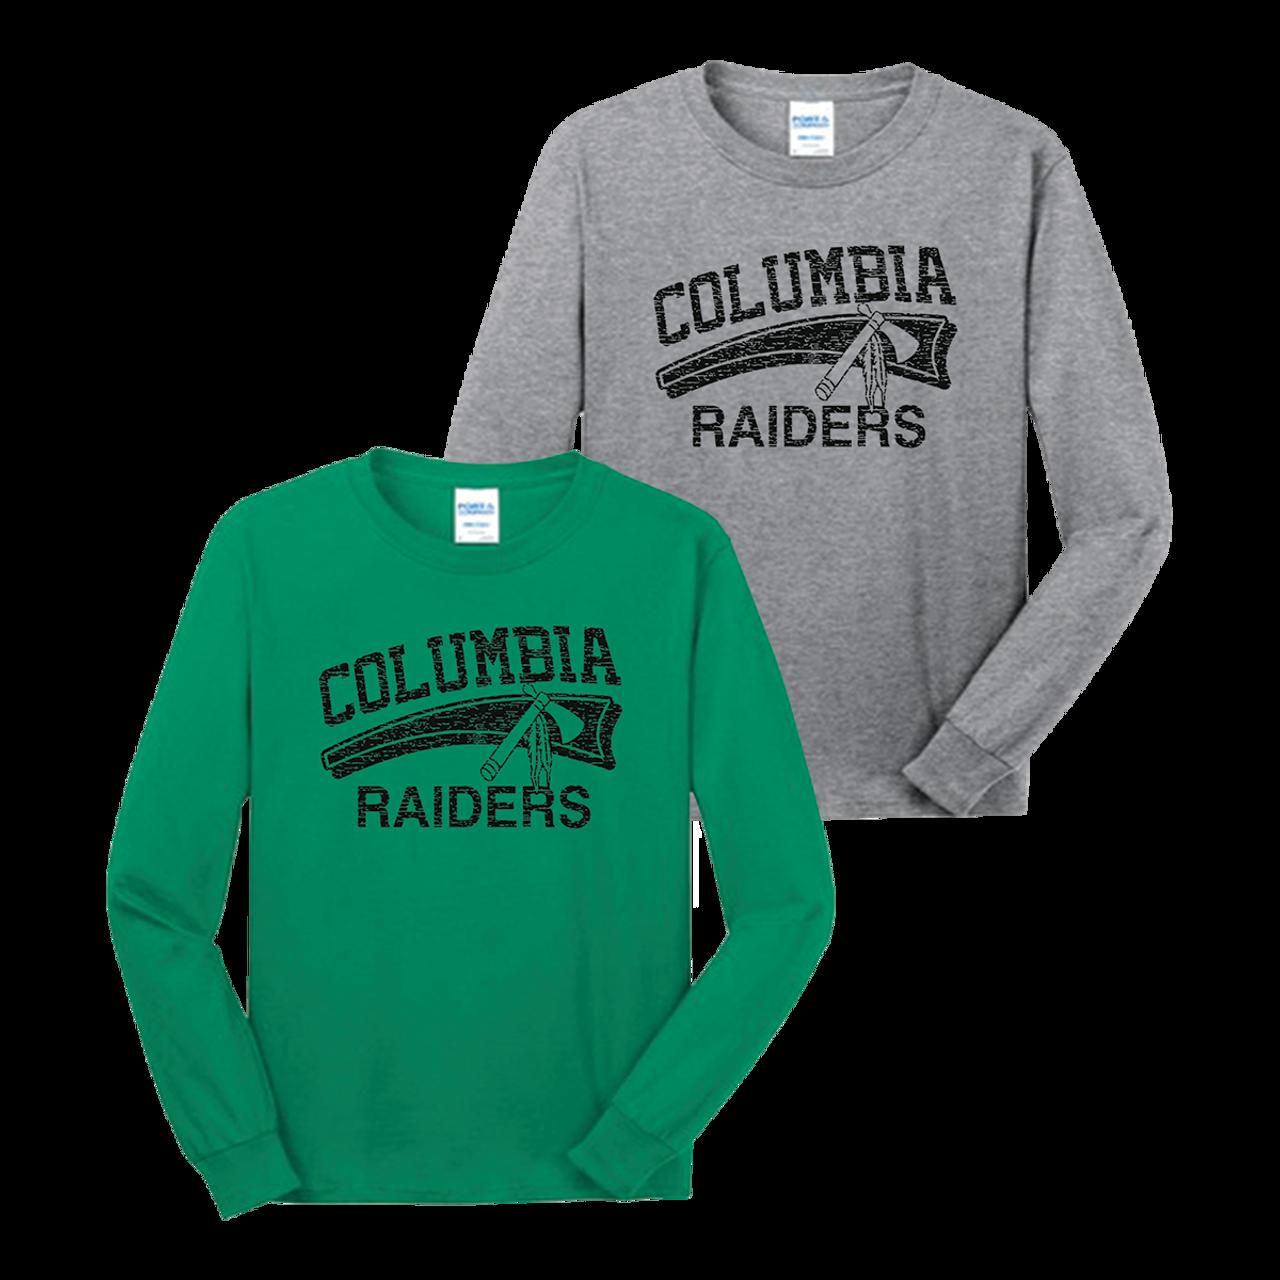 fe320f2355bca Columbia Raiders LS Tee (F185) - RycoSports